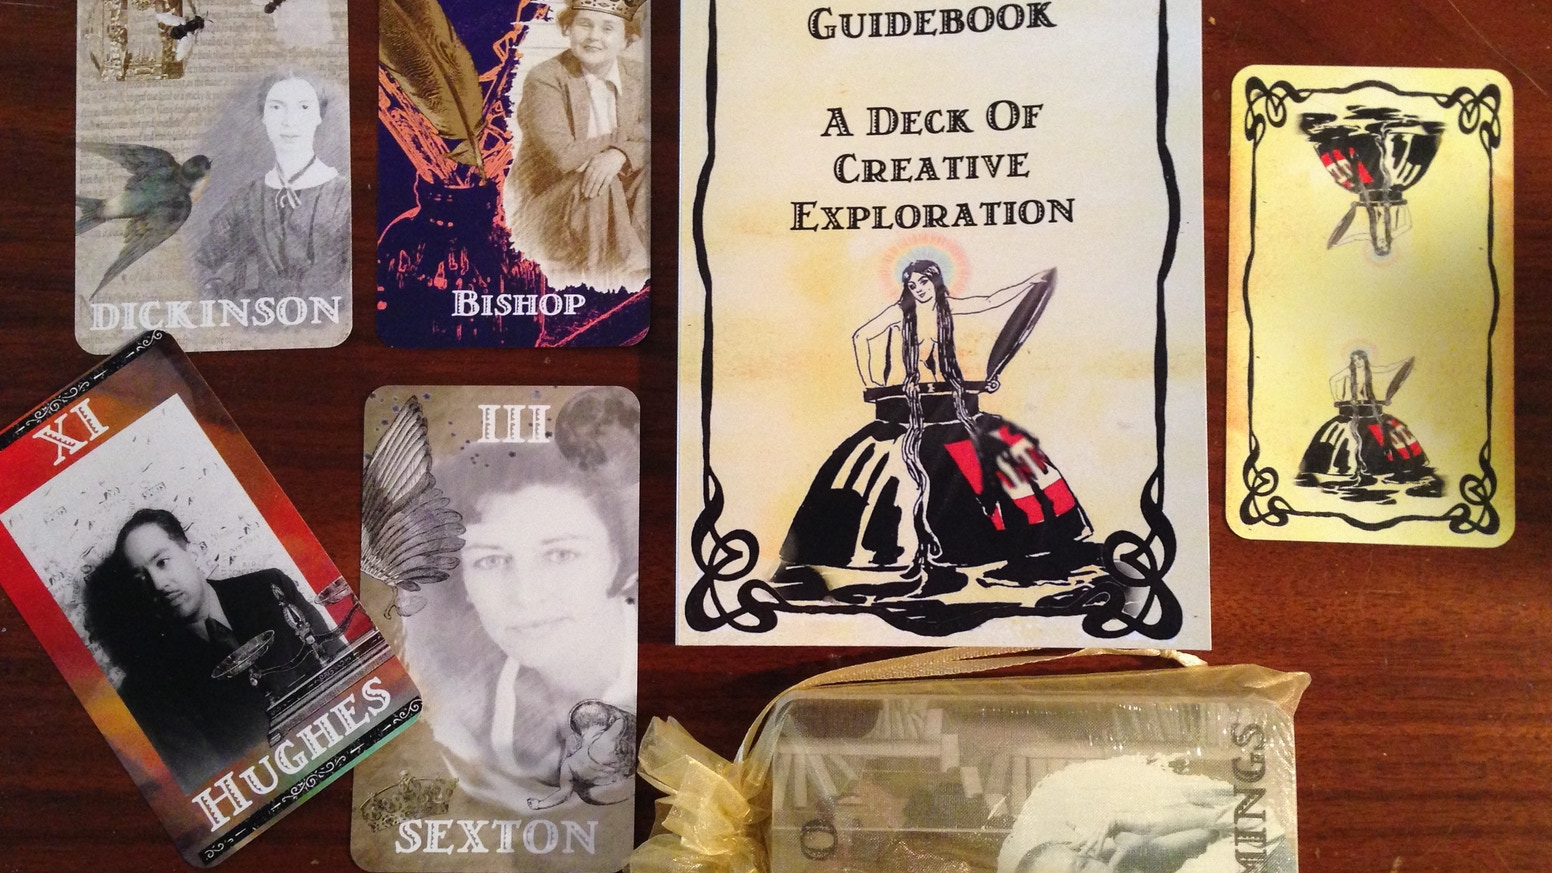 The Poet Tarot: A Deck of Creative Exploration